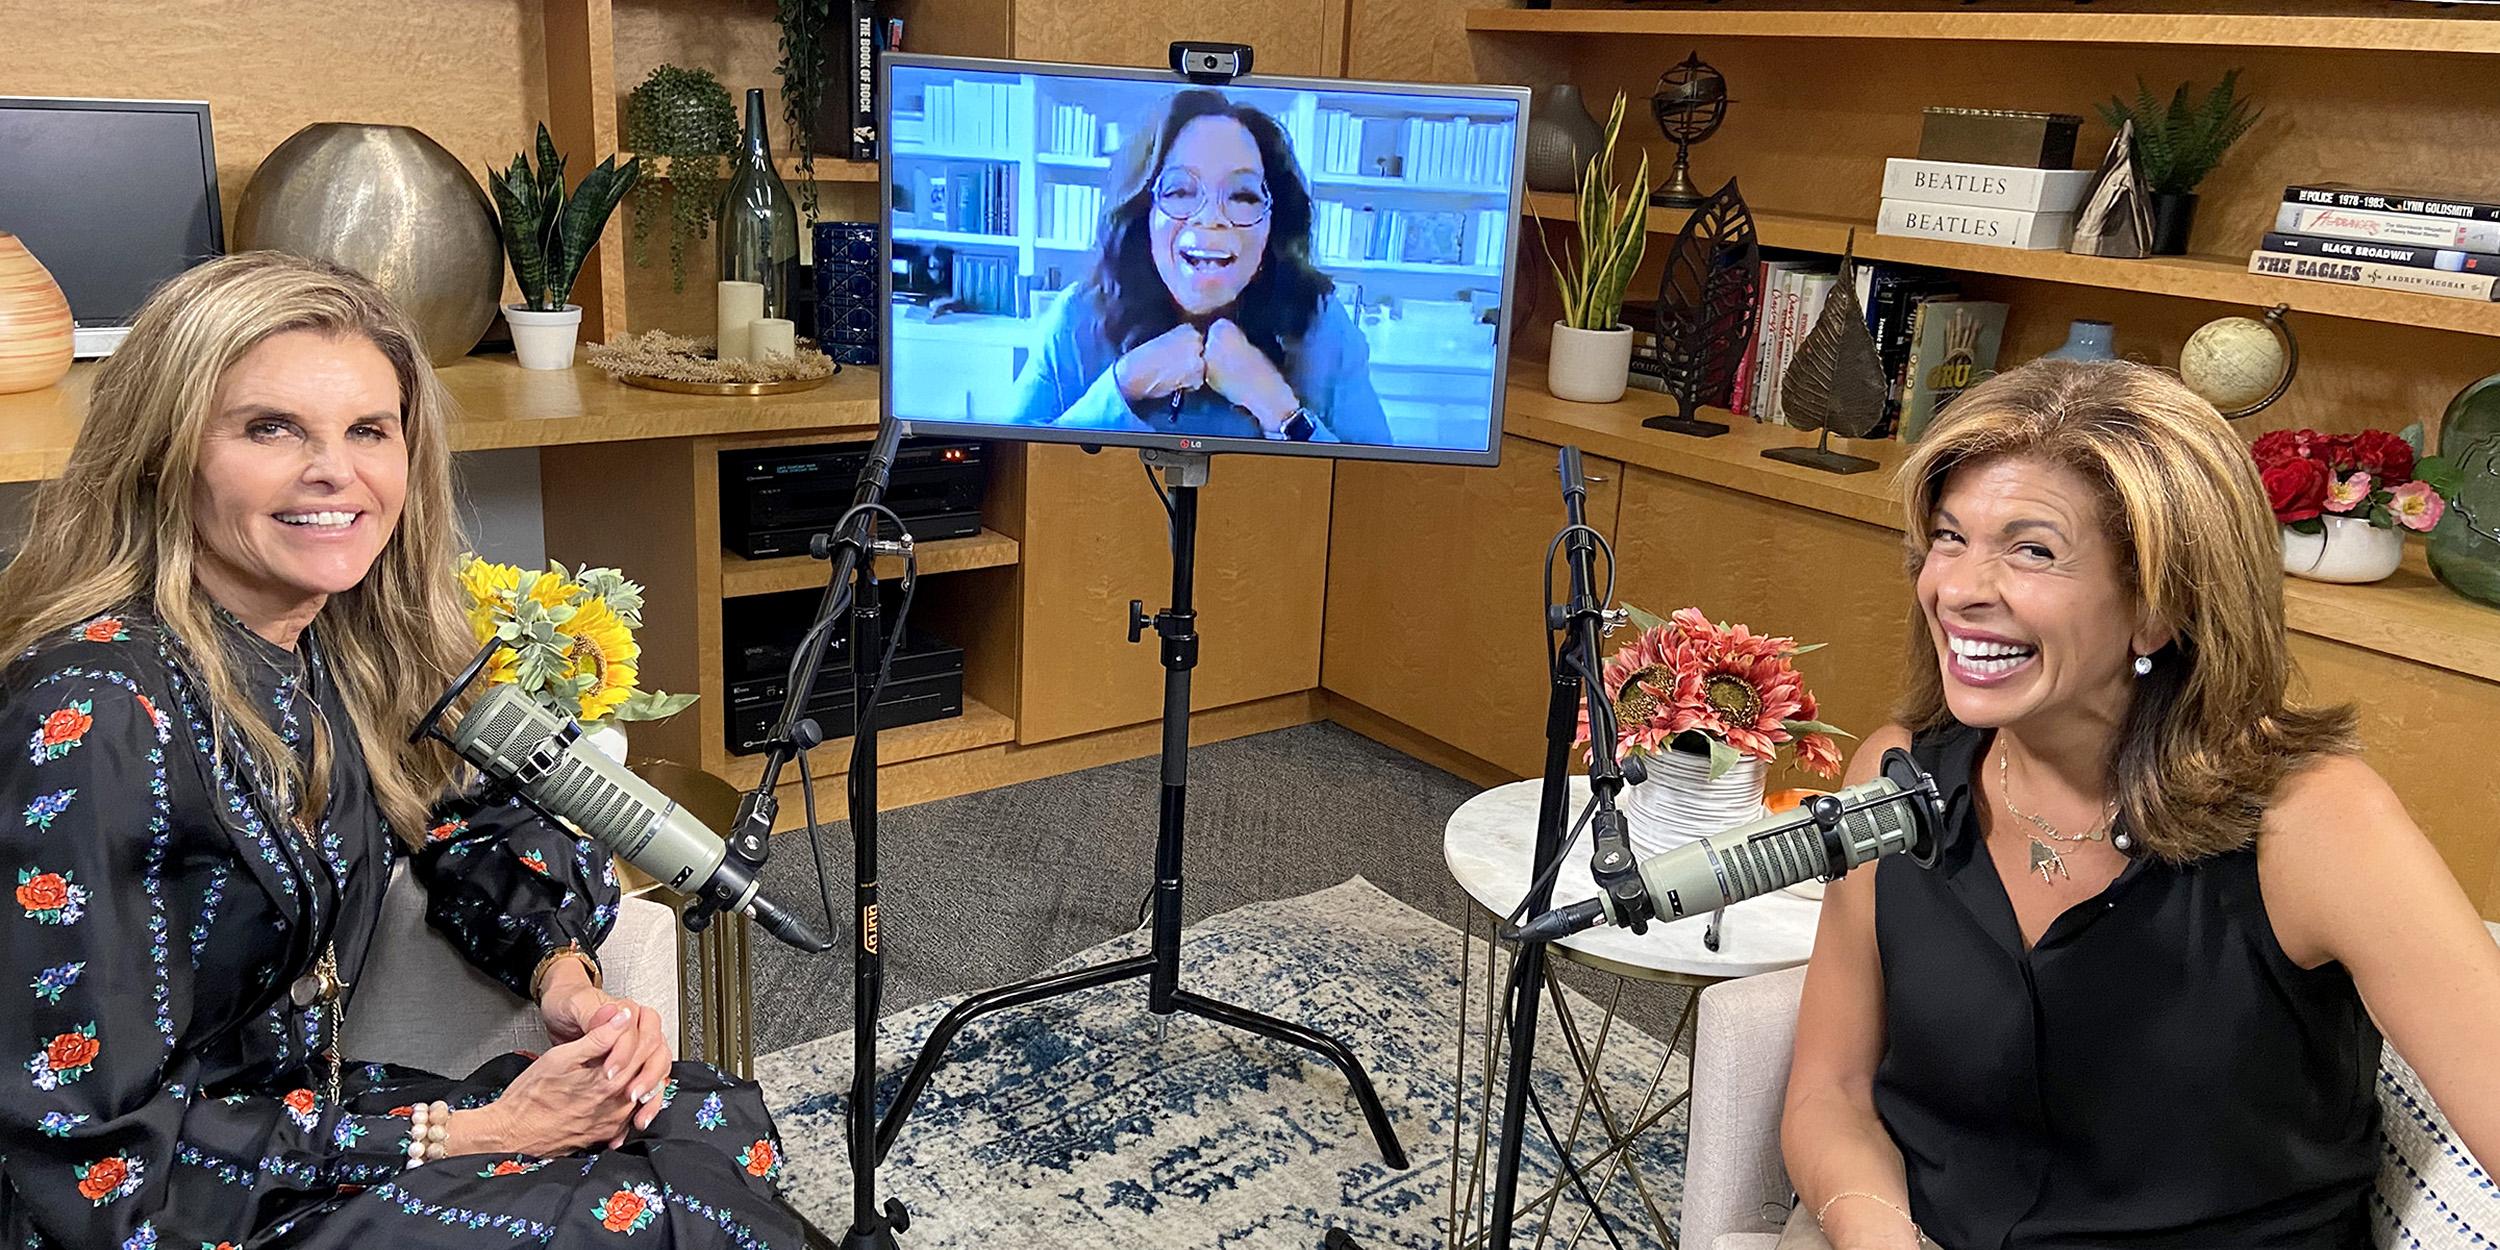 Oprah Winfrey tells Hoda Kotb that she has three close friends